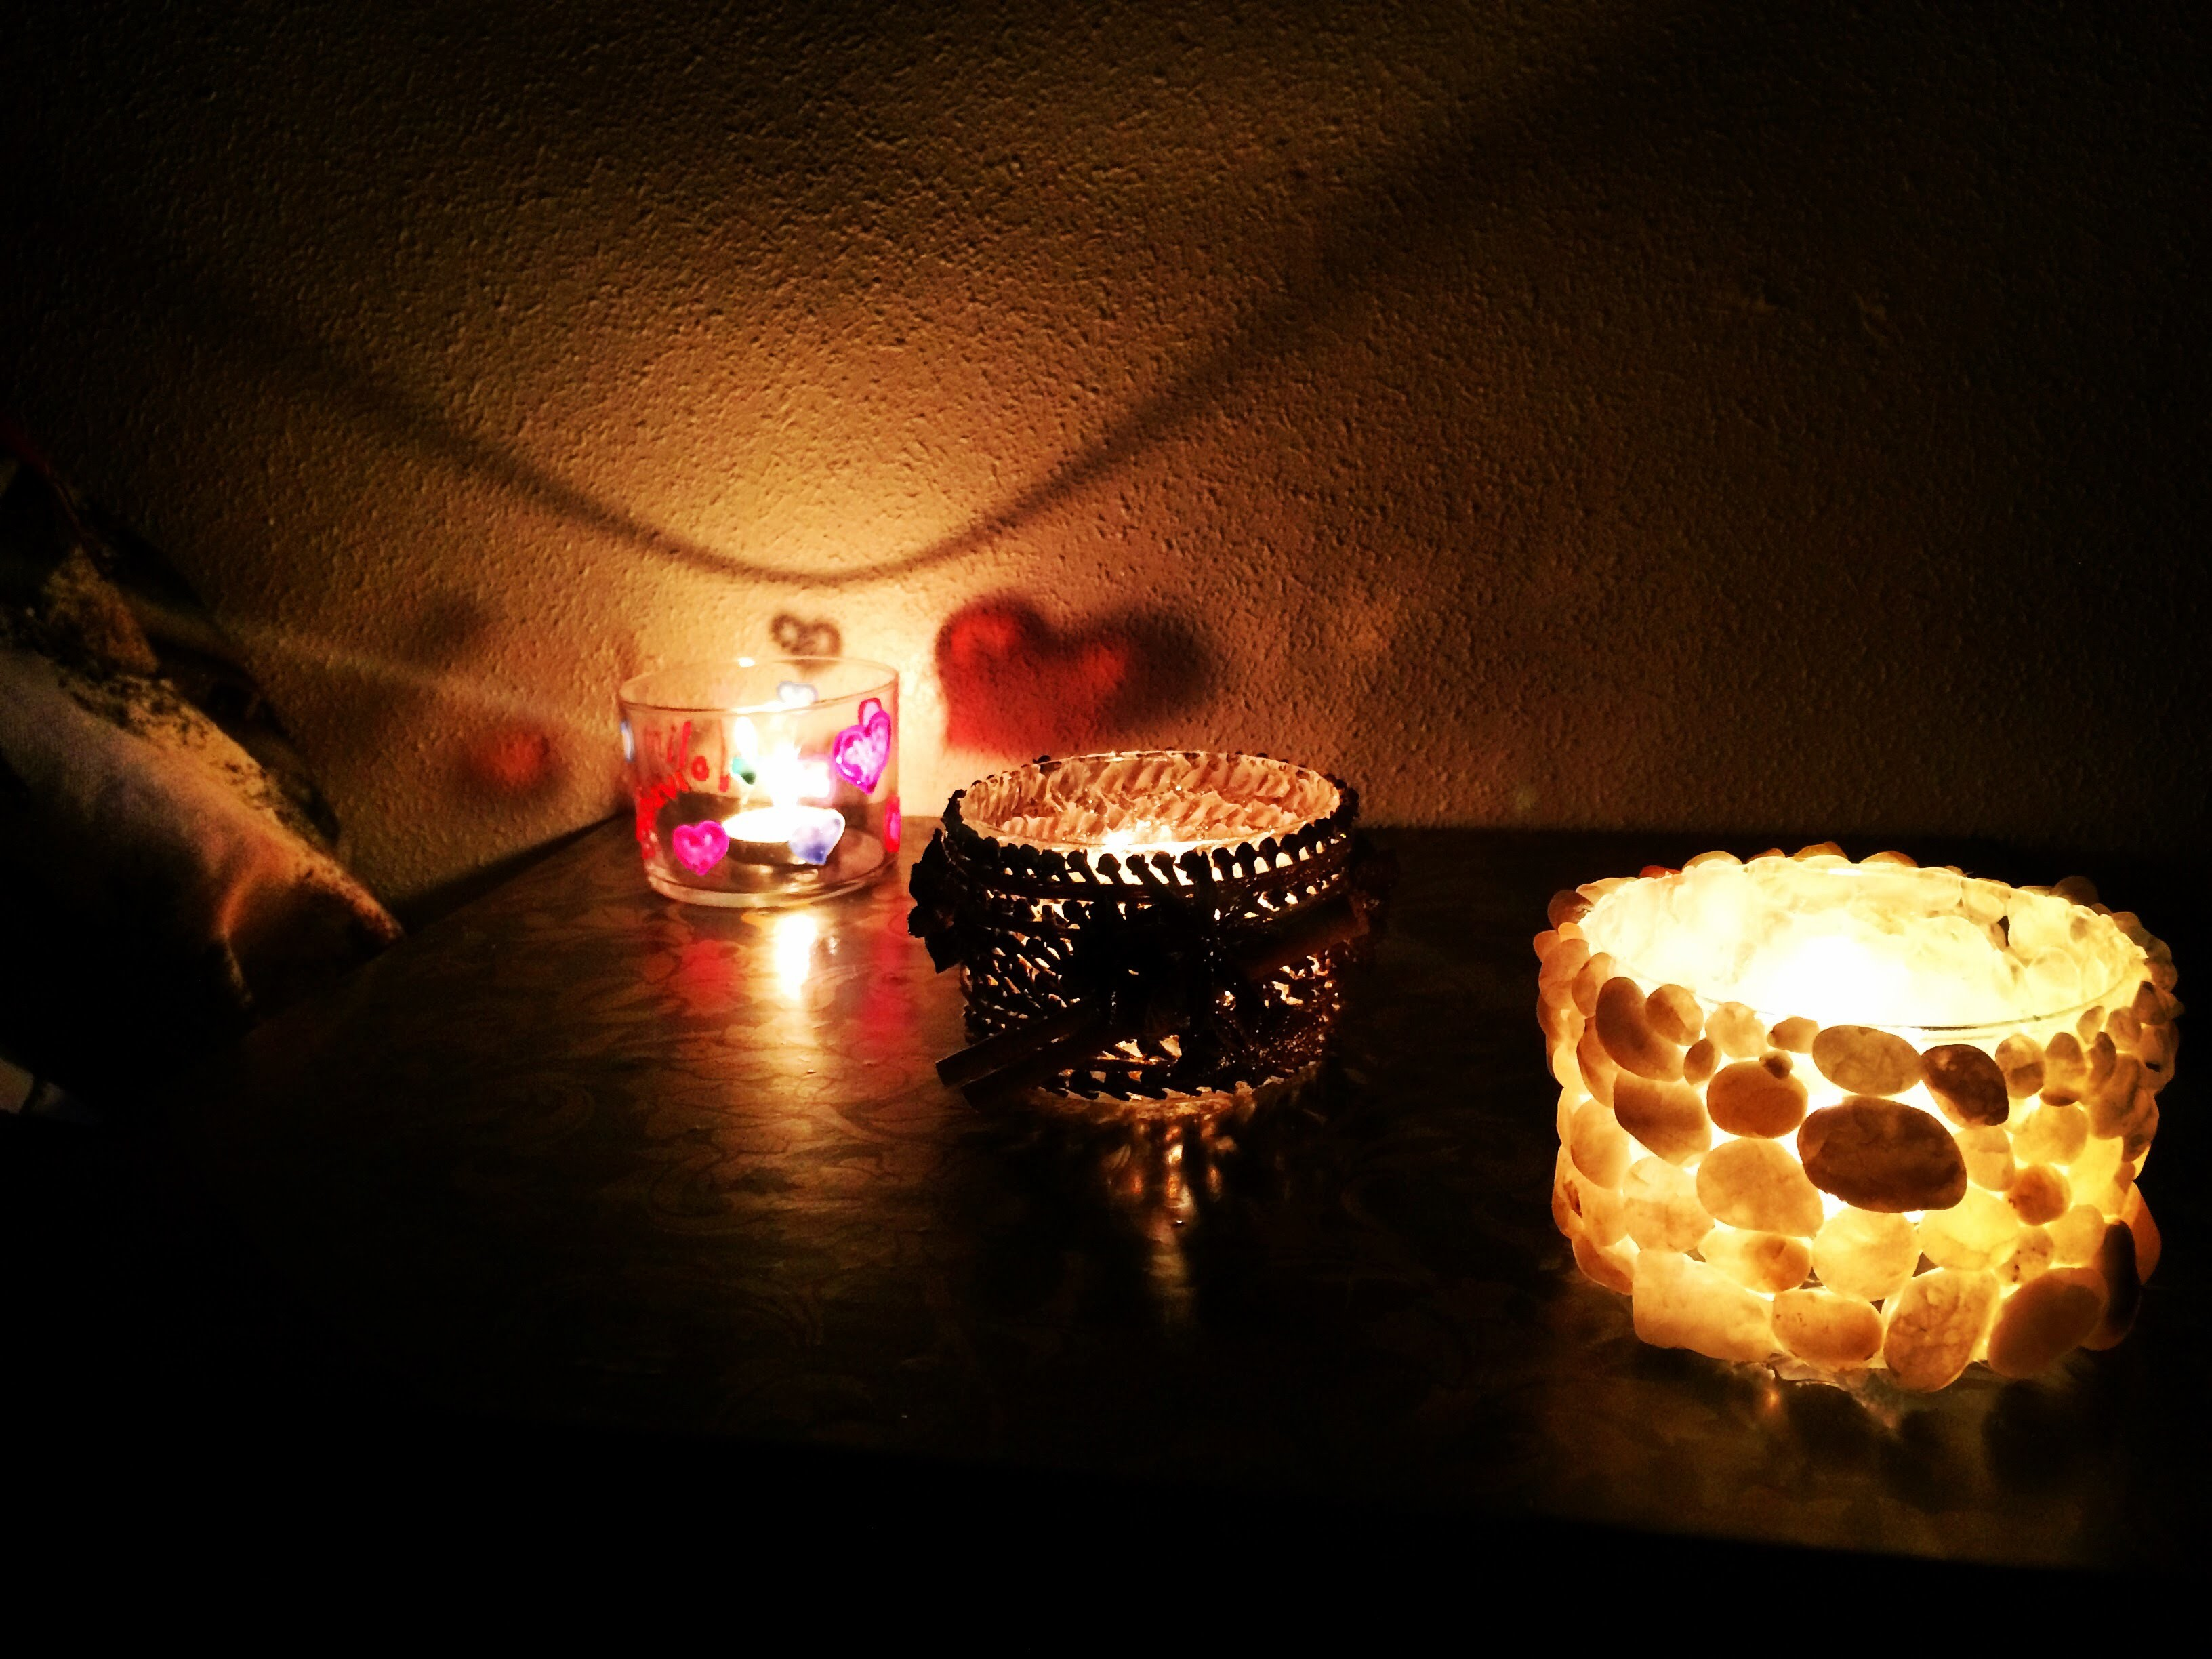 DIY Porta velas fácil  (make candle holders)